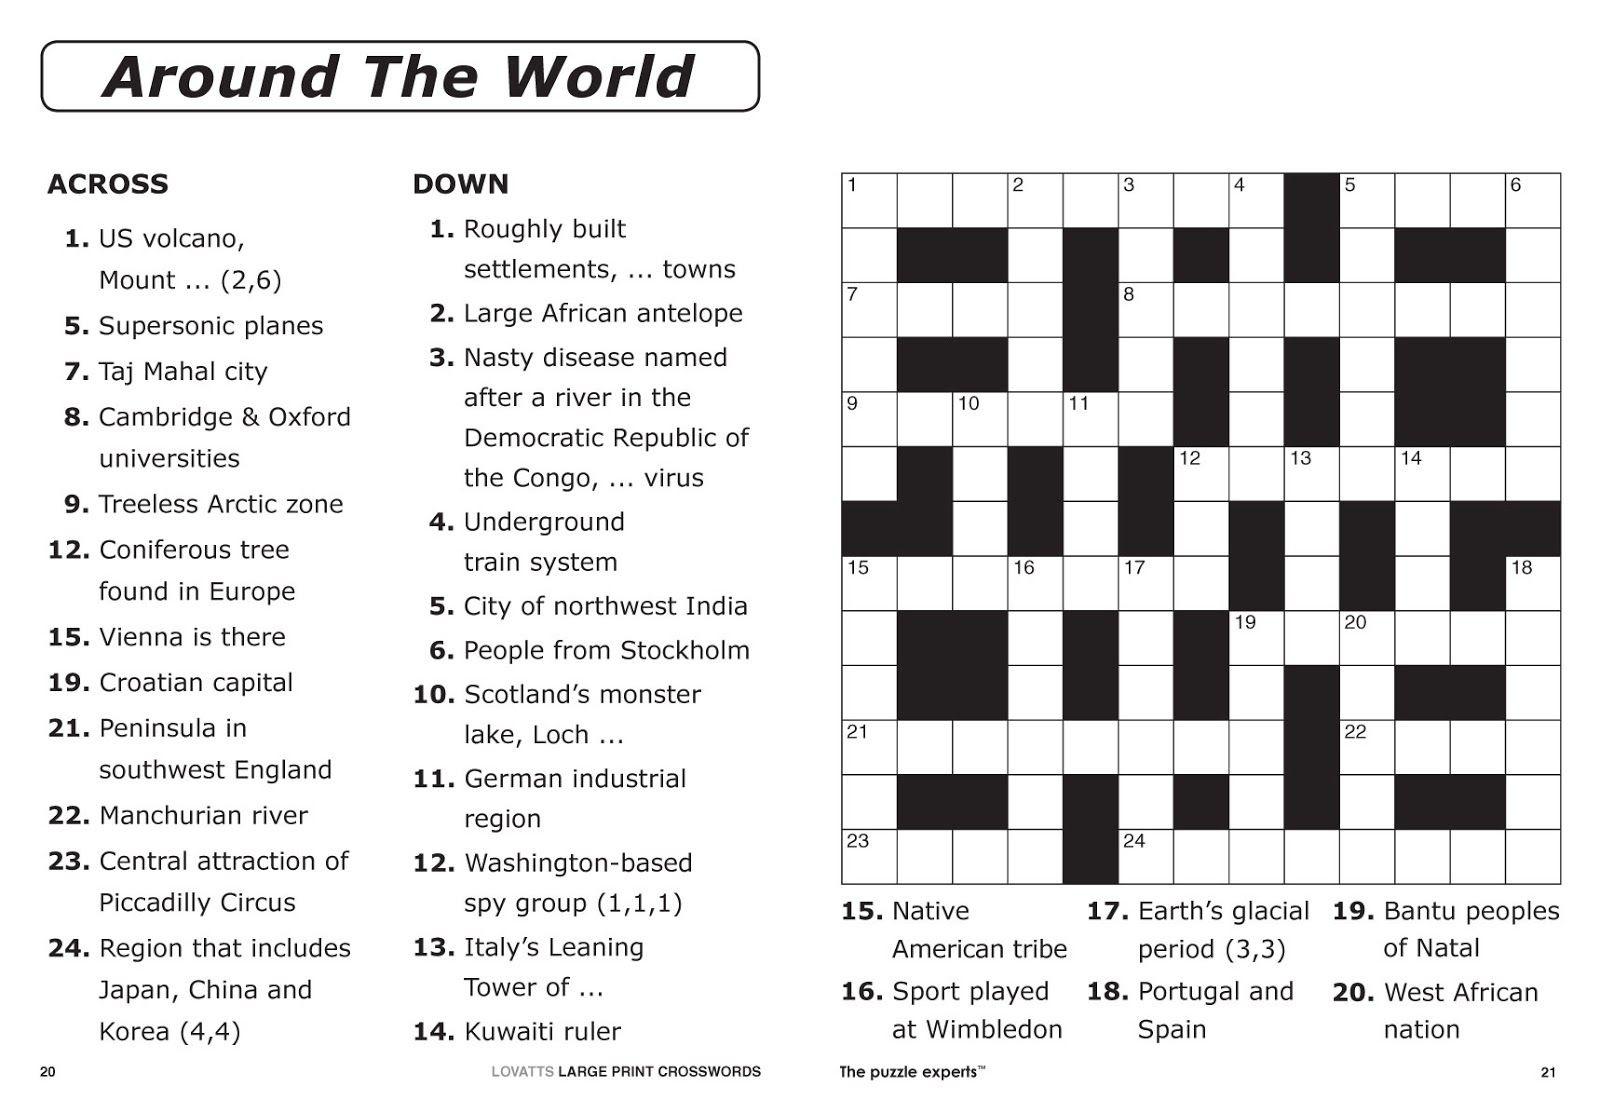 Free Printable Large Print Crossword Puzzles | M3U8 - Free Printable Word Search Puzzles Adults Large Print